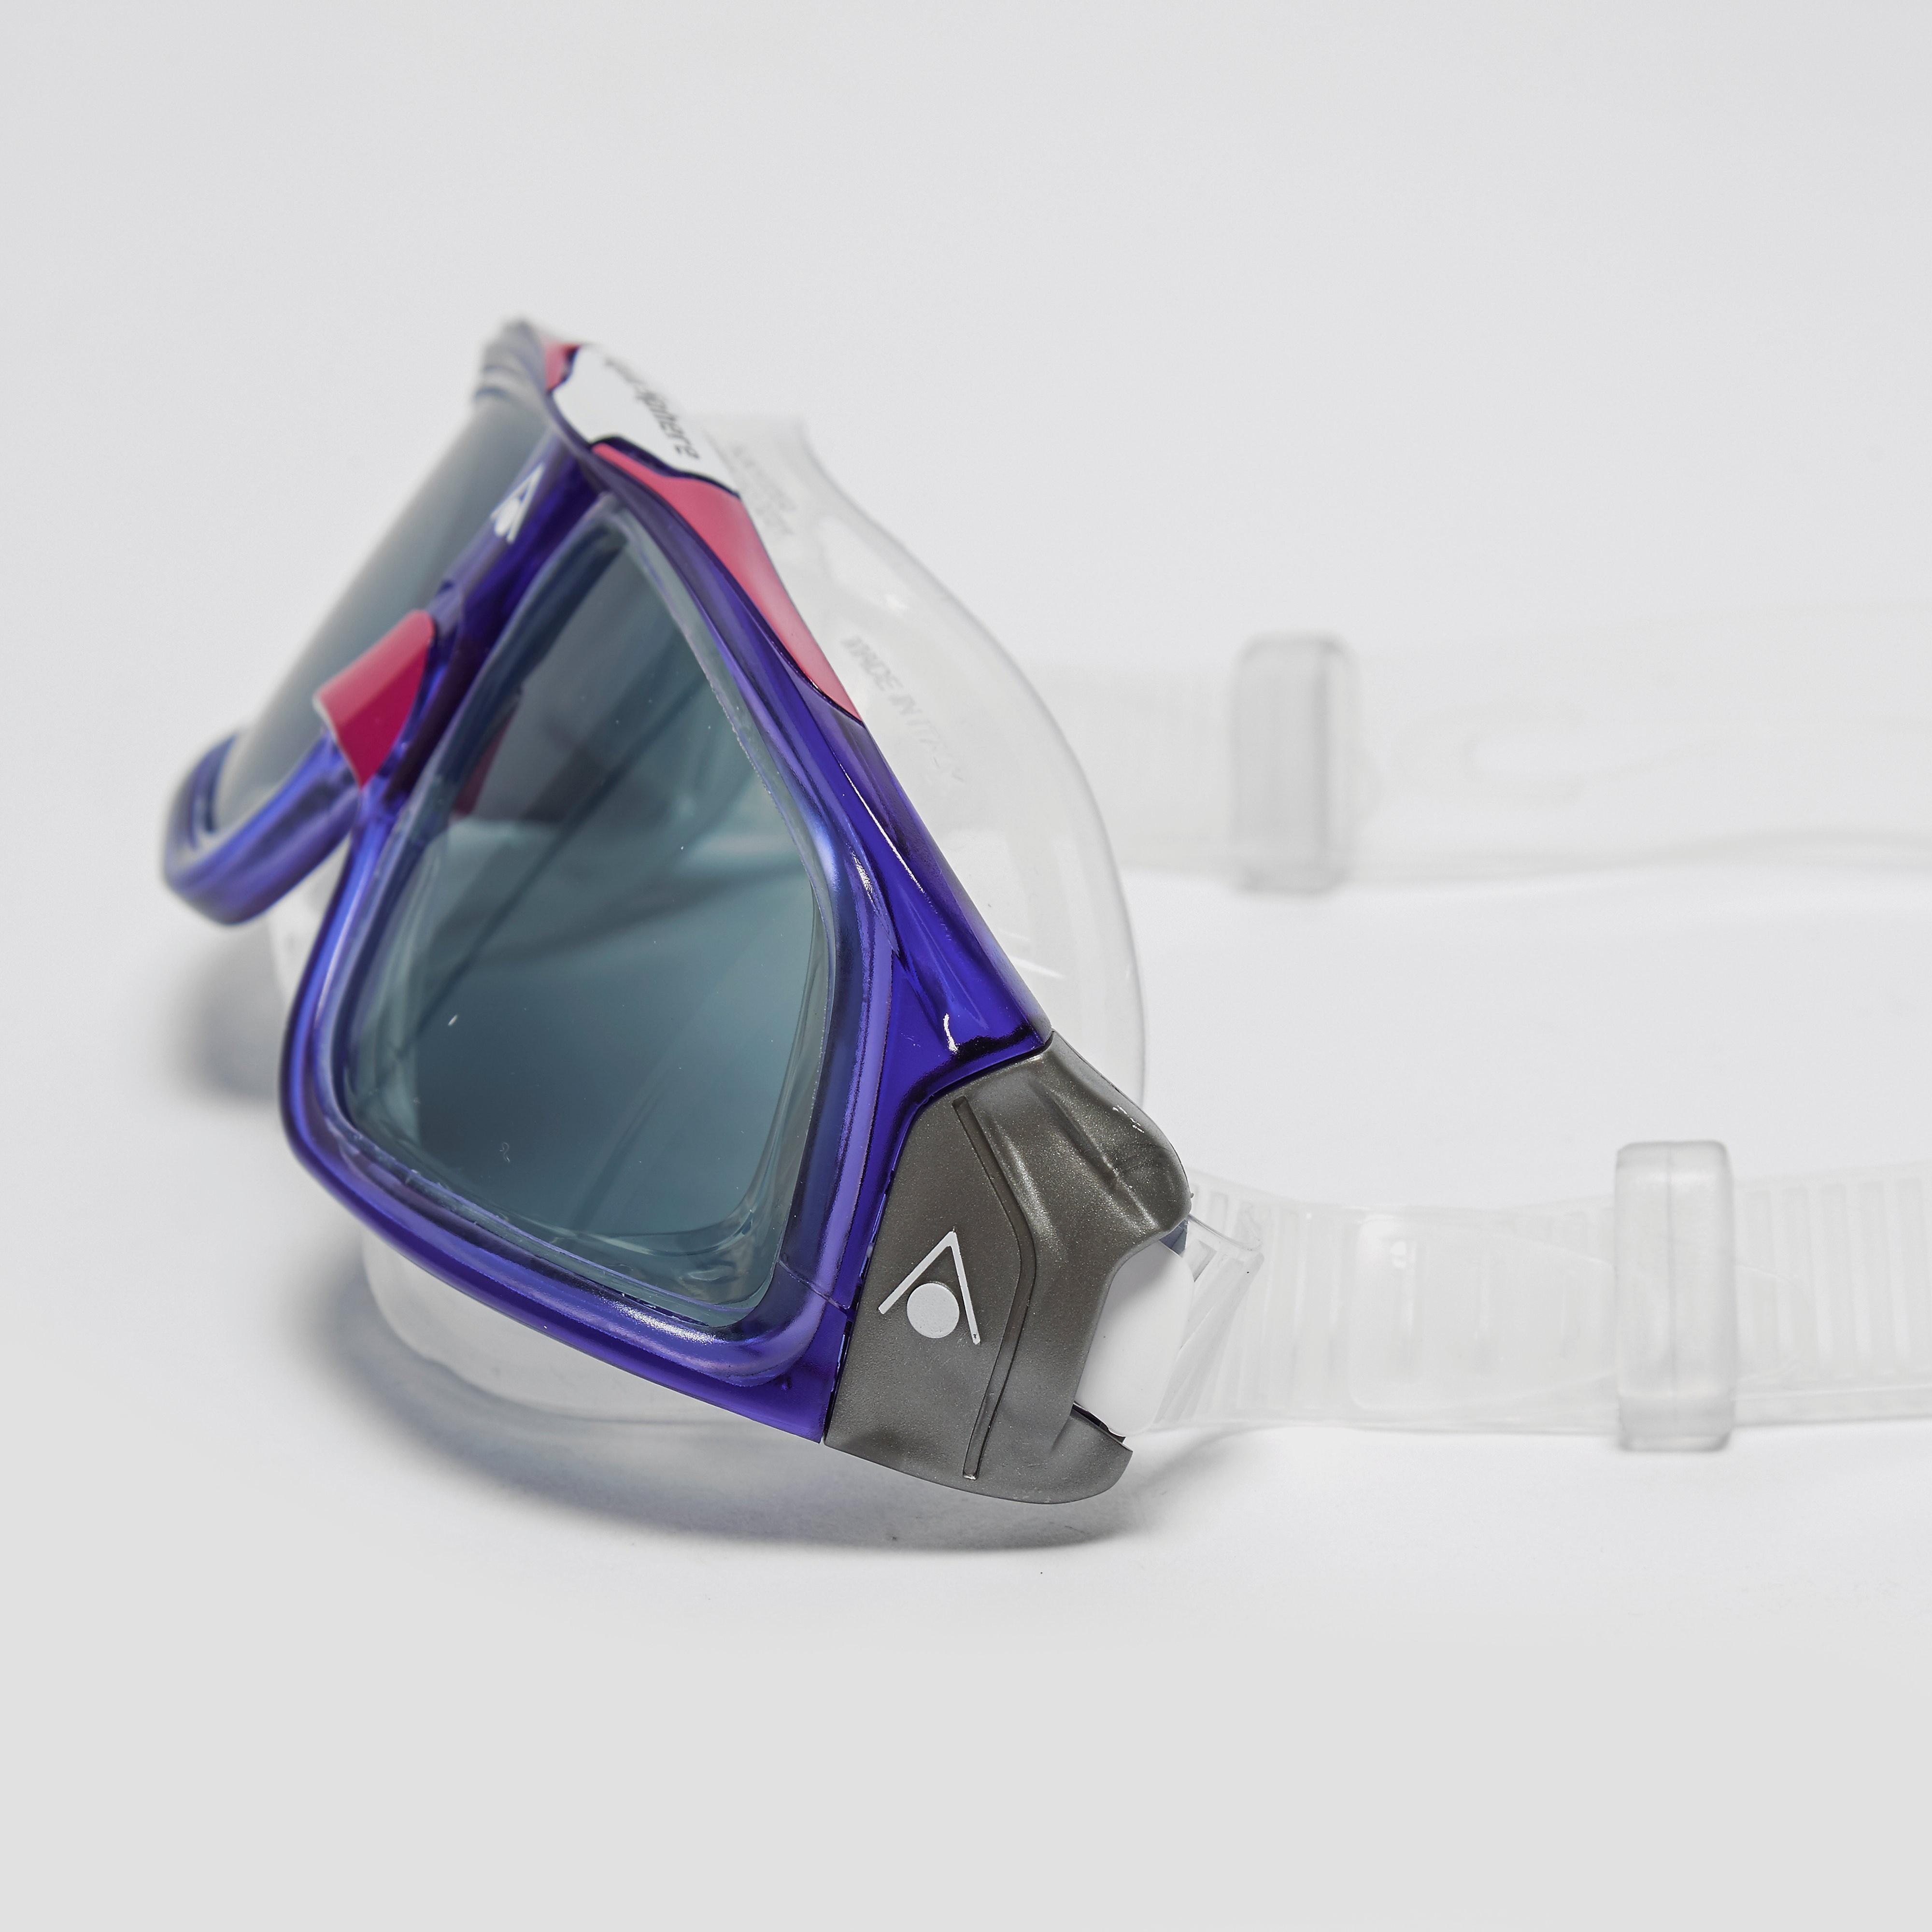 Aqua Sphere Seal 2.0 Women's Mask